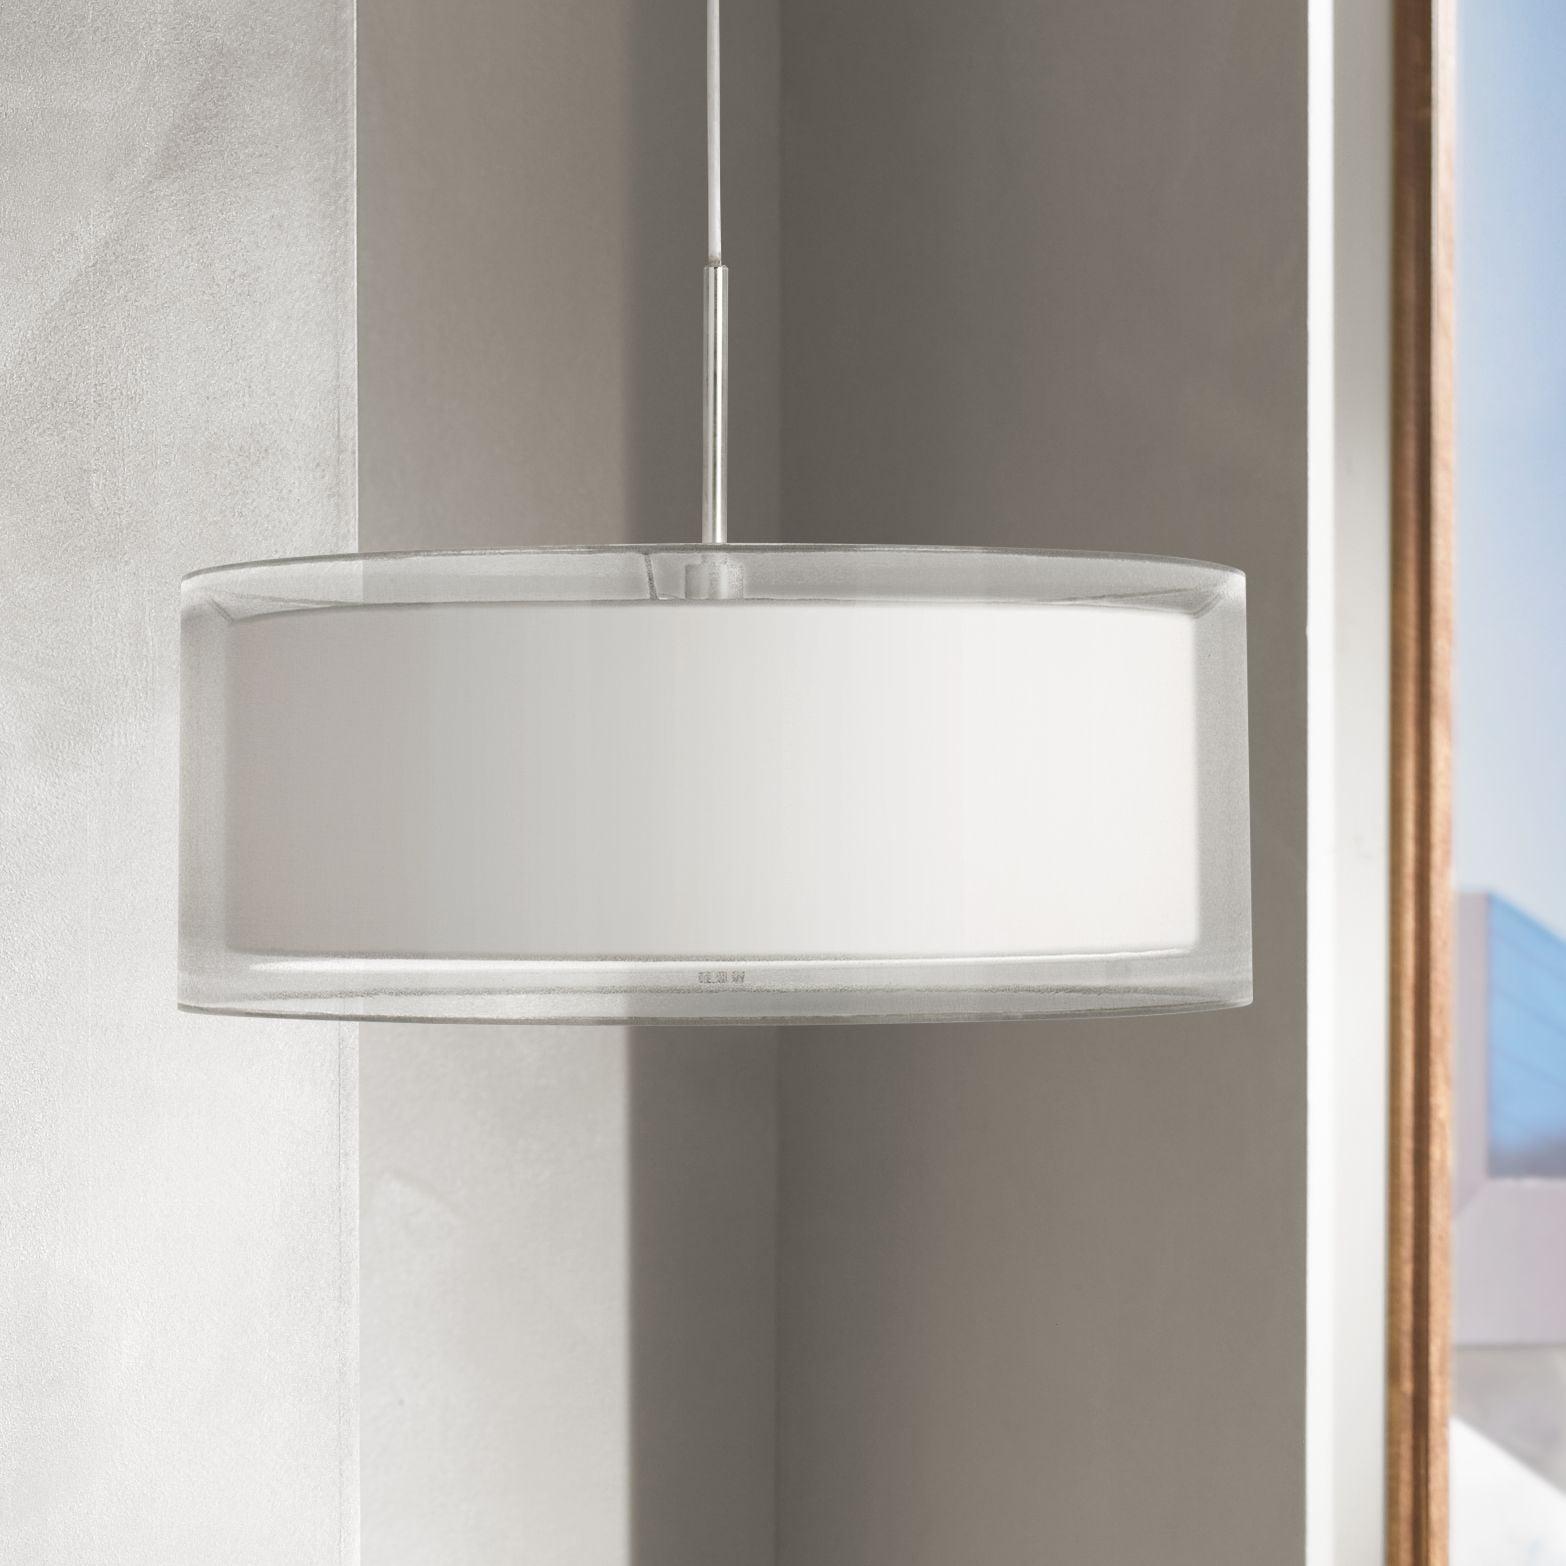 Image of: Possini Euro Design Brushed Nickel Drum Pendant Chandelier 20 Wide Modern Silver Organza White Hardback Shade For Kitchen Island Walmart Com Walmart Com